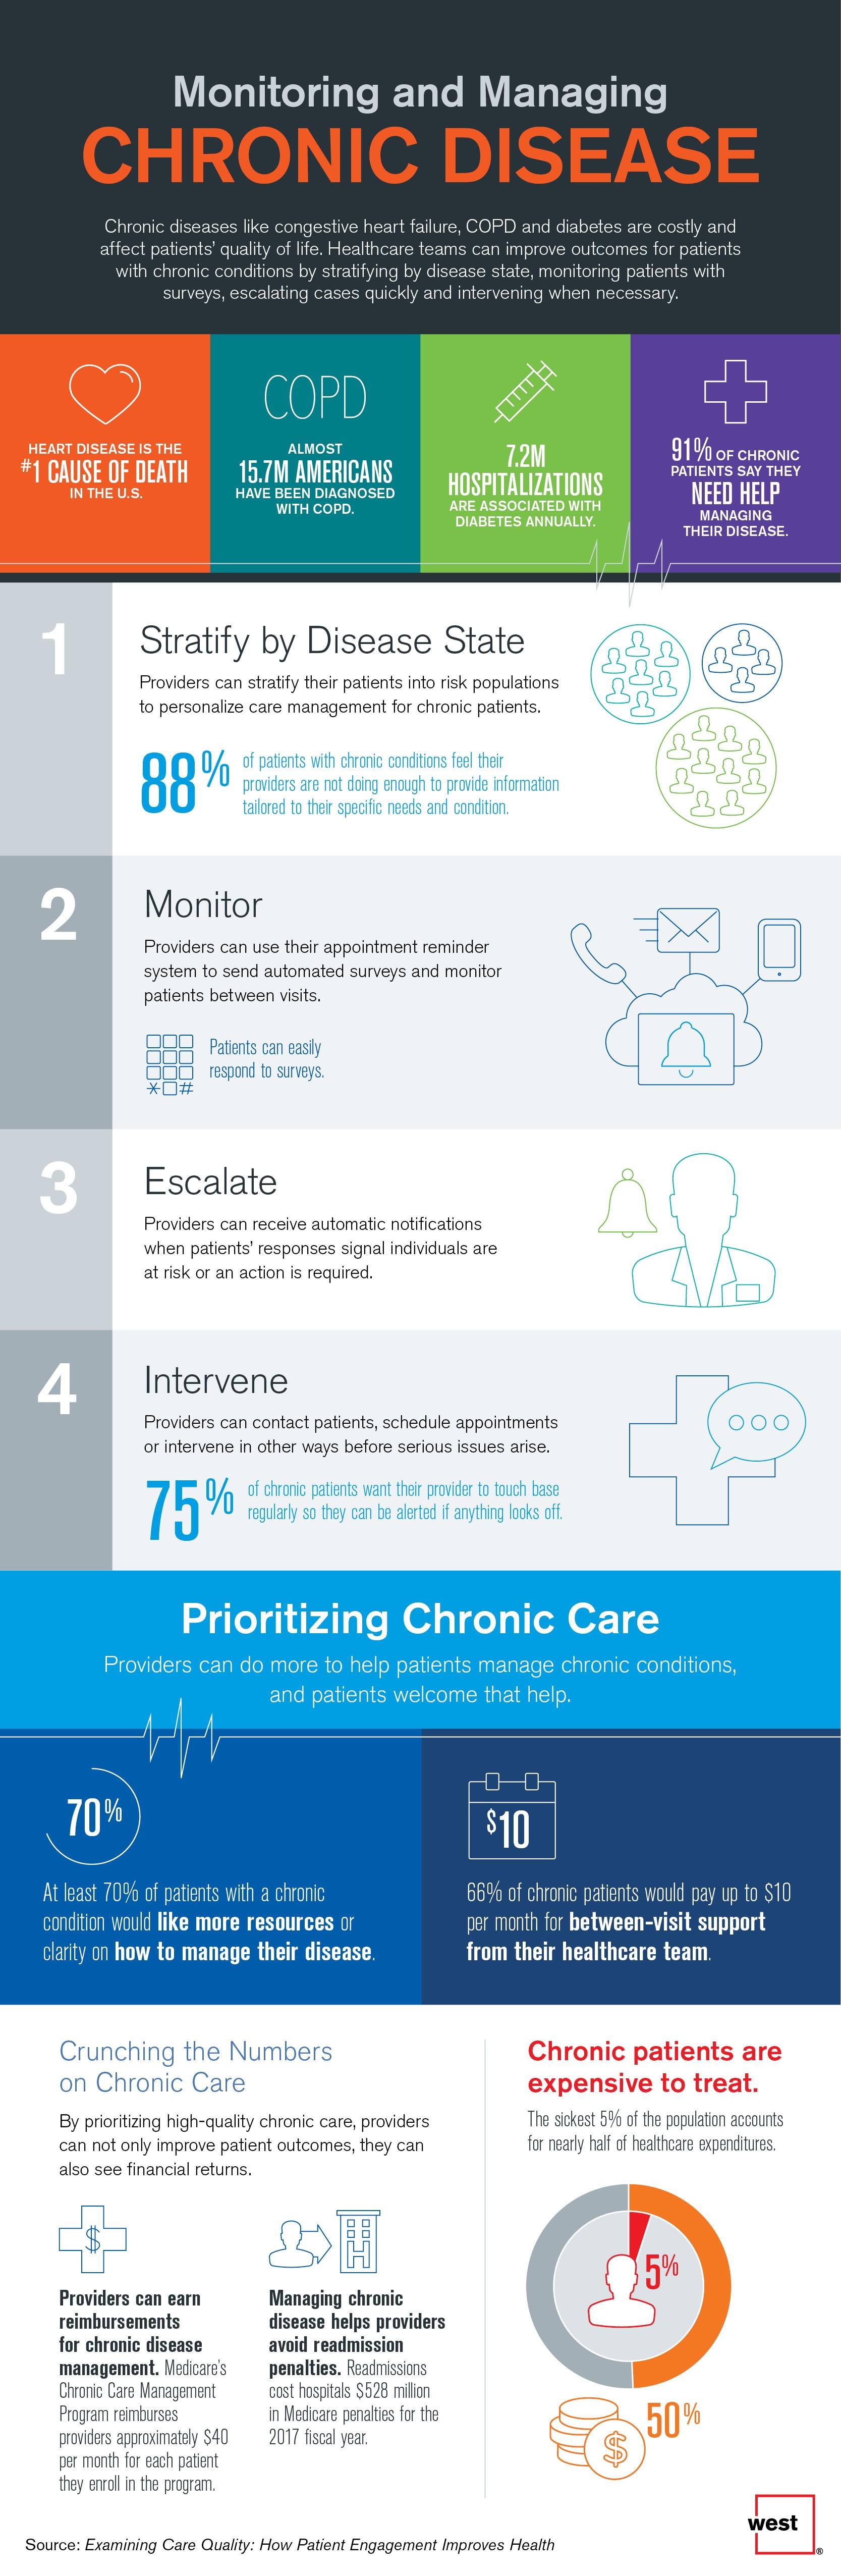 Monitoring and Managing Chronic Disease